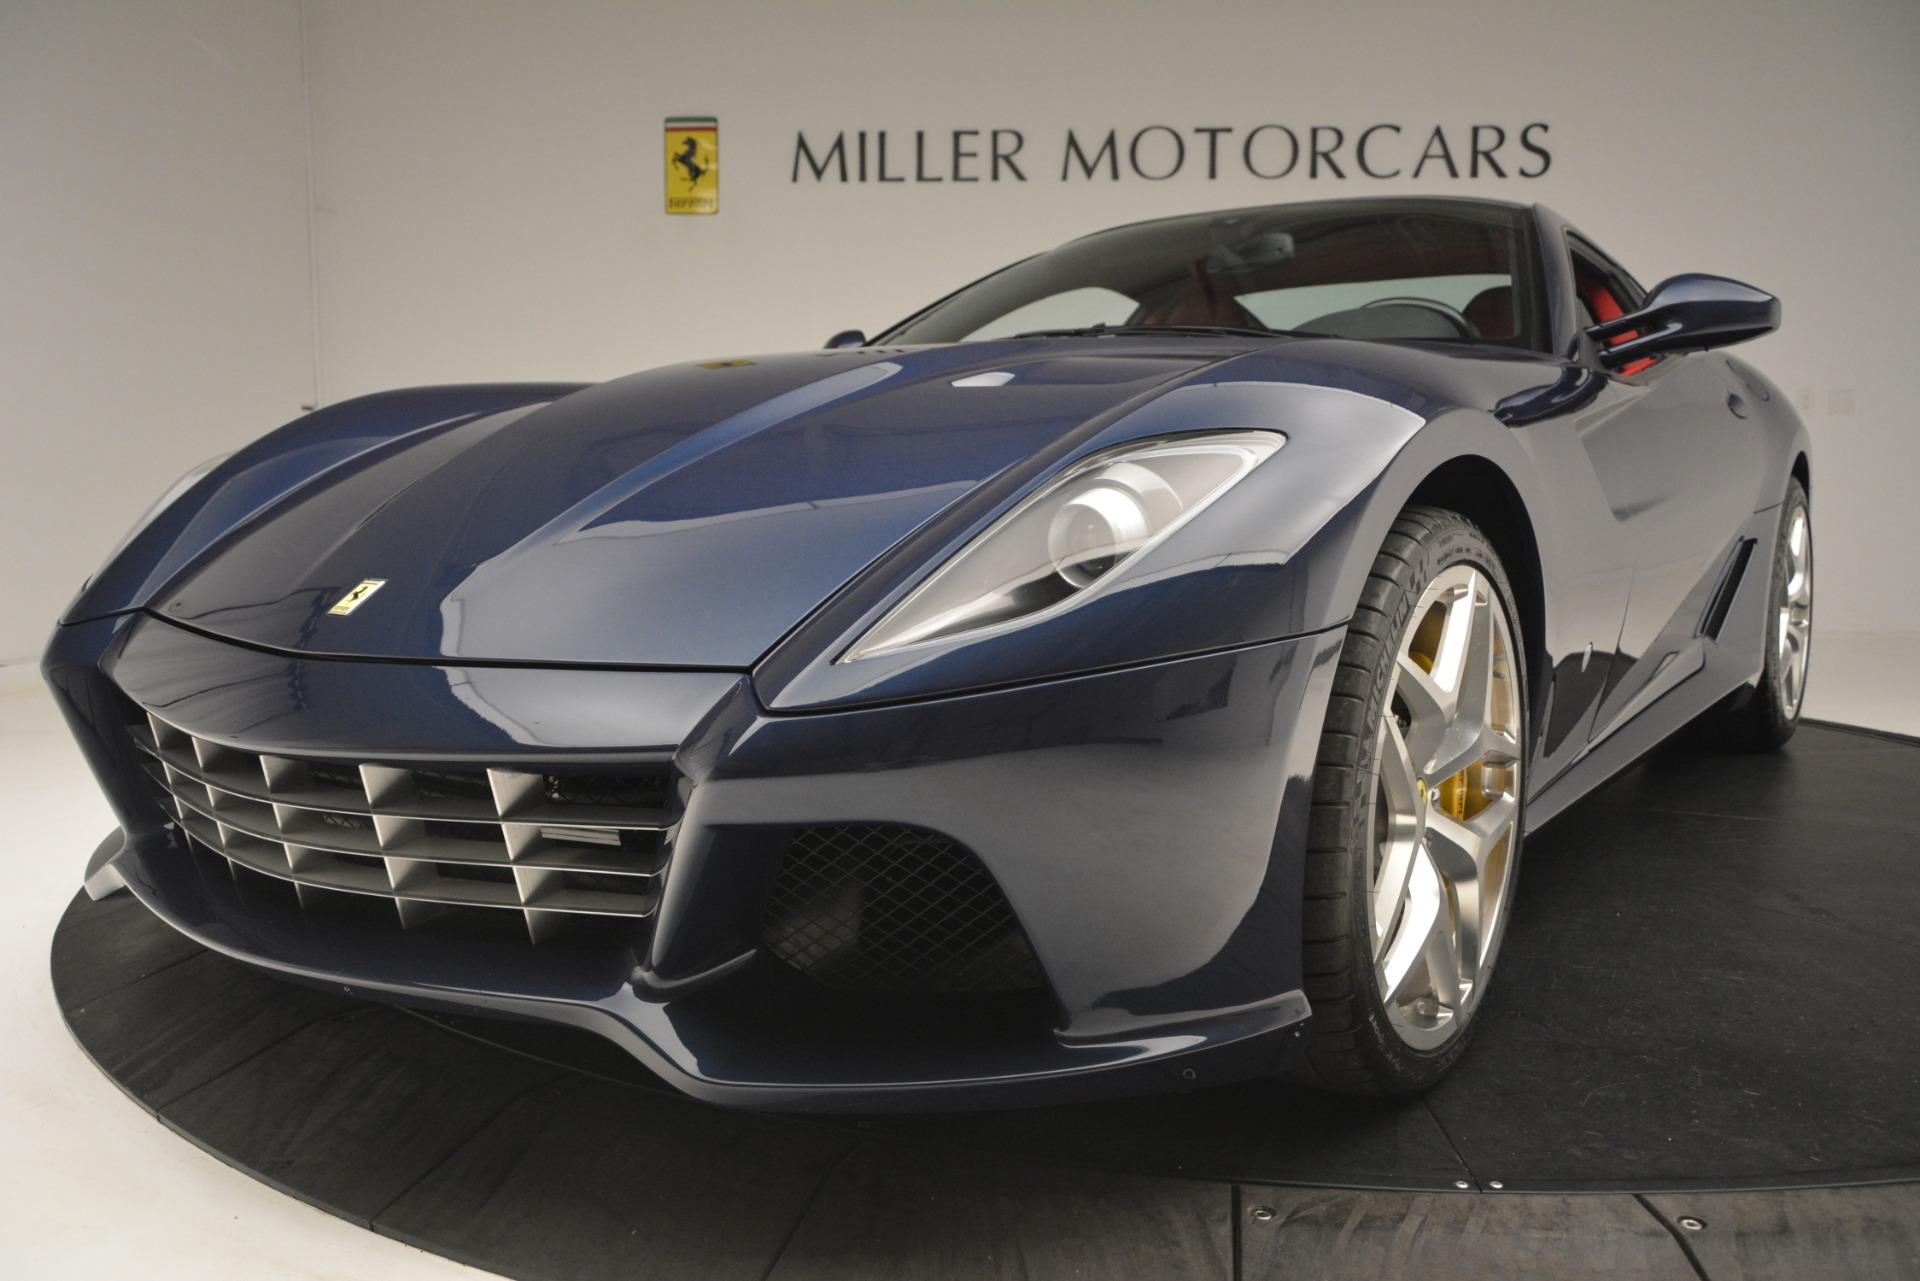 Te koop: Bijzondere one of Ferrari 599 GTB Fiorano!